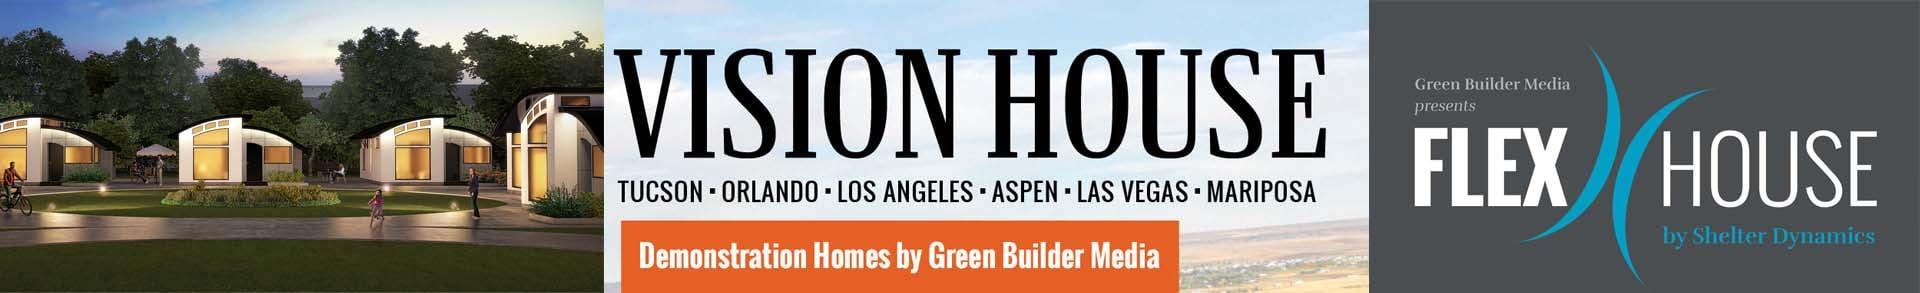 Green Builder Vision House Flex HOuse